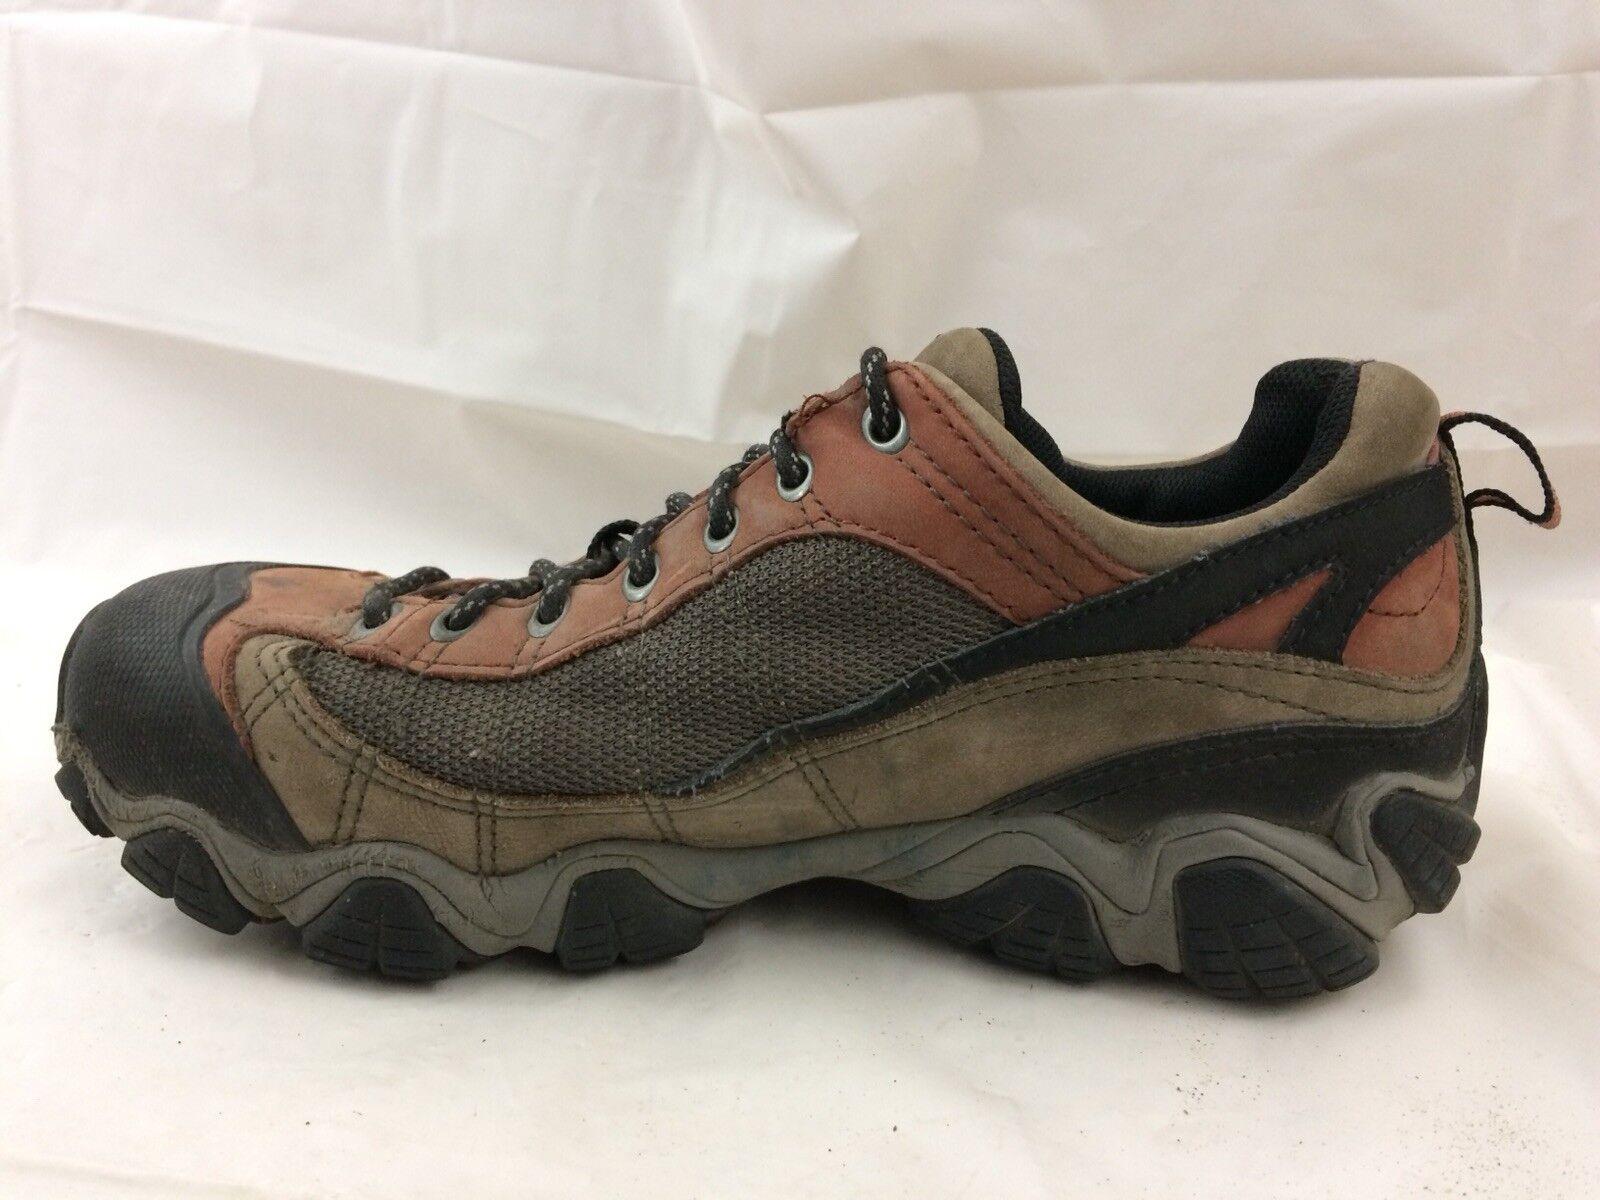 Oboz Mens 9 Medium Hiking Trail shoes Sport Sneaker Red Brown Leather Waterproof